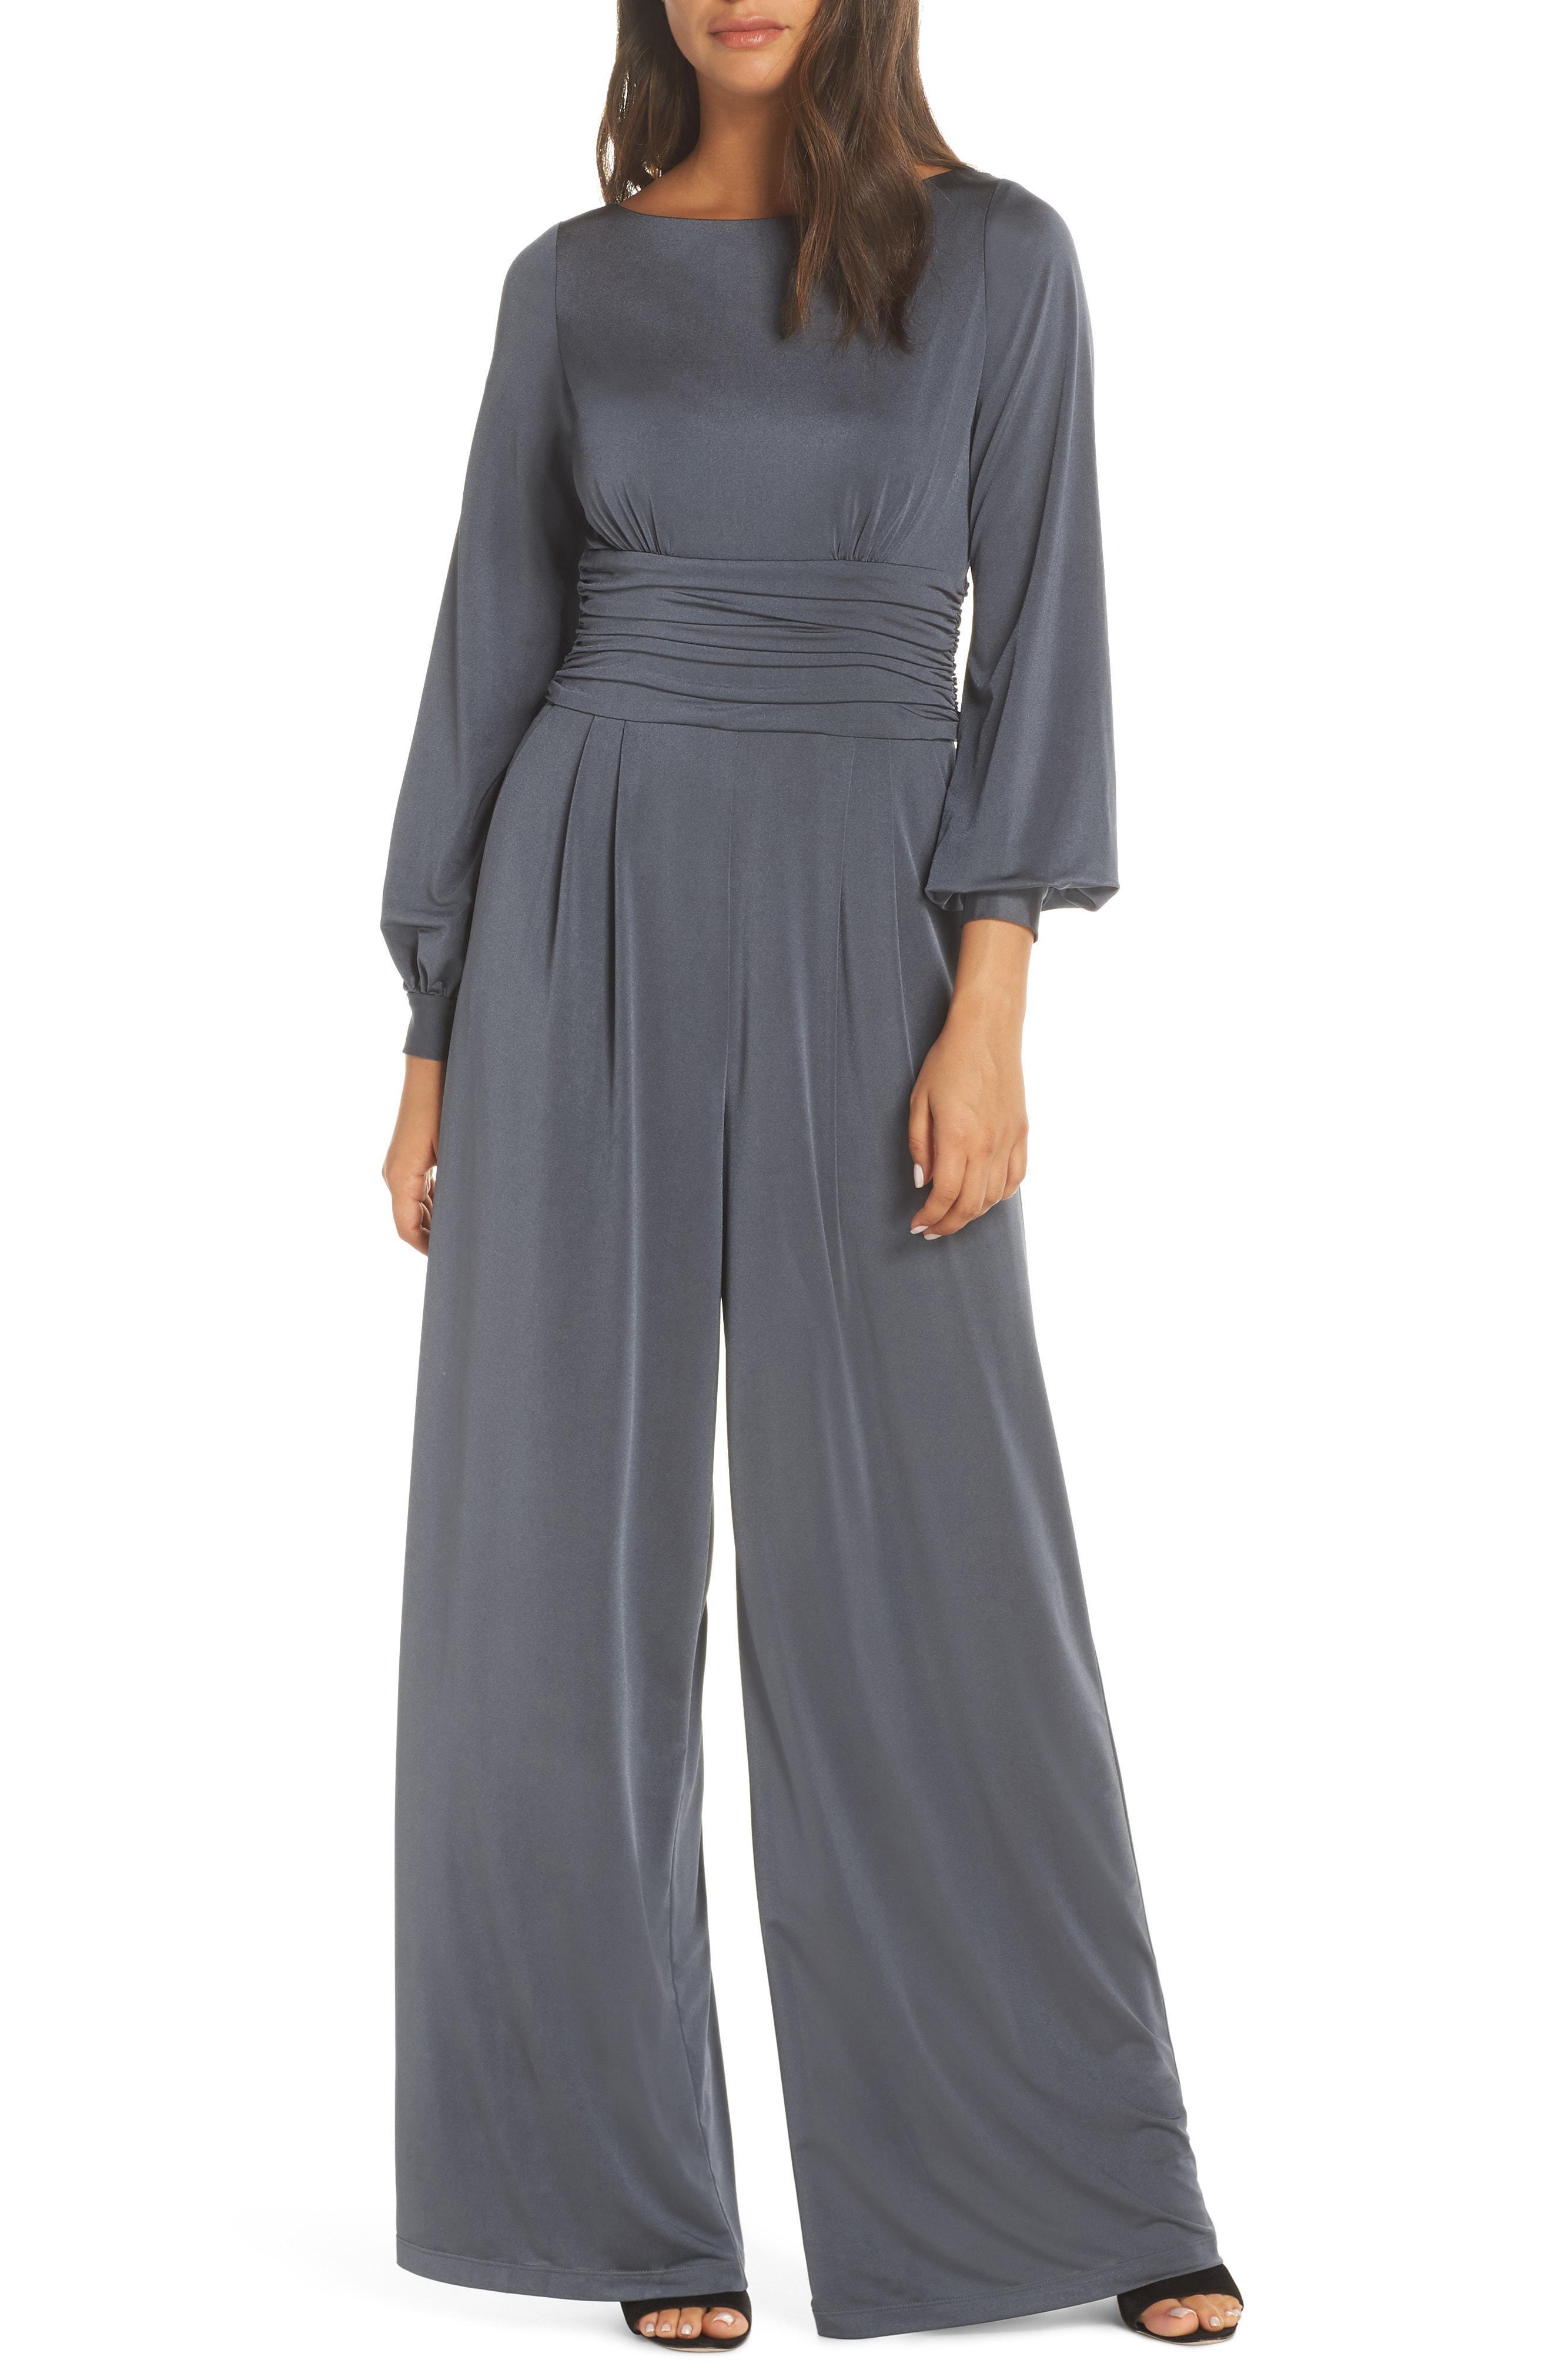 bbec966682c0 Eliza J Wide Leg Jumpsuit in Gray - Save 40% - Lyst